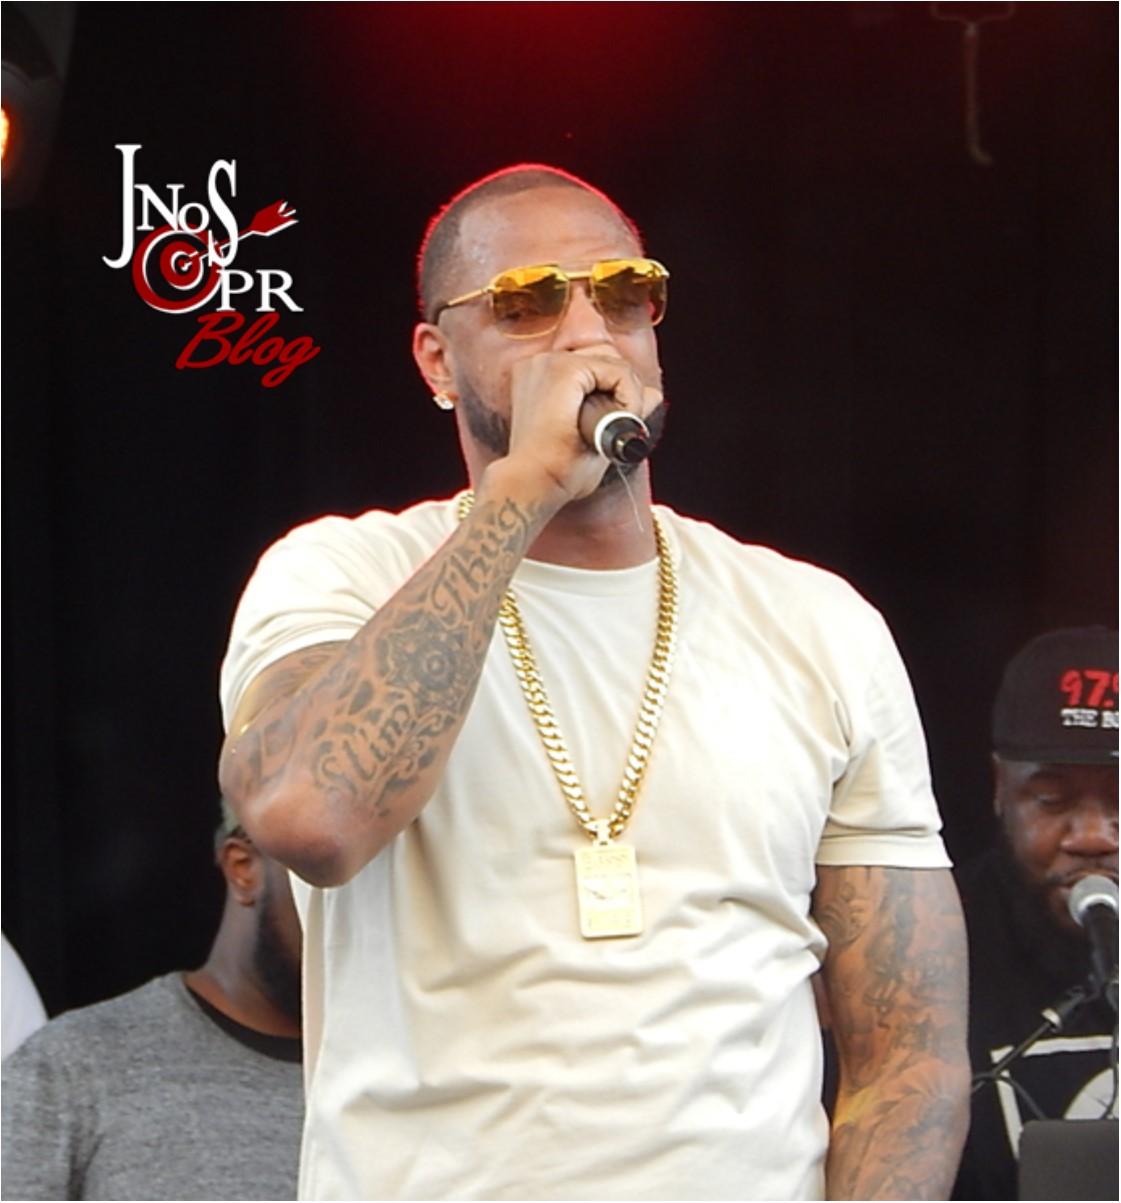 Slim Thug Performing at SXSW